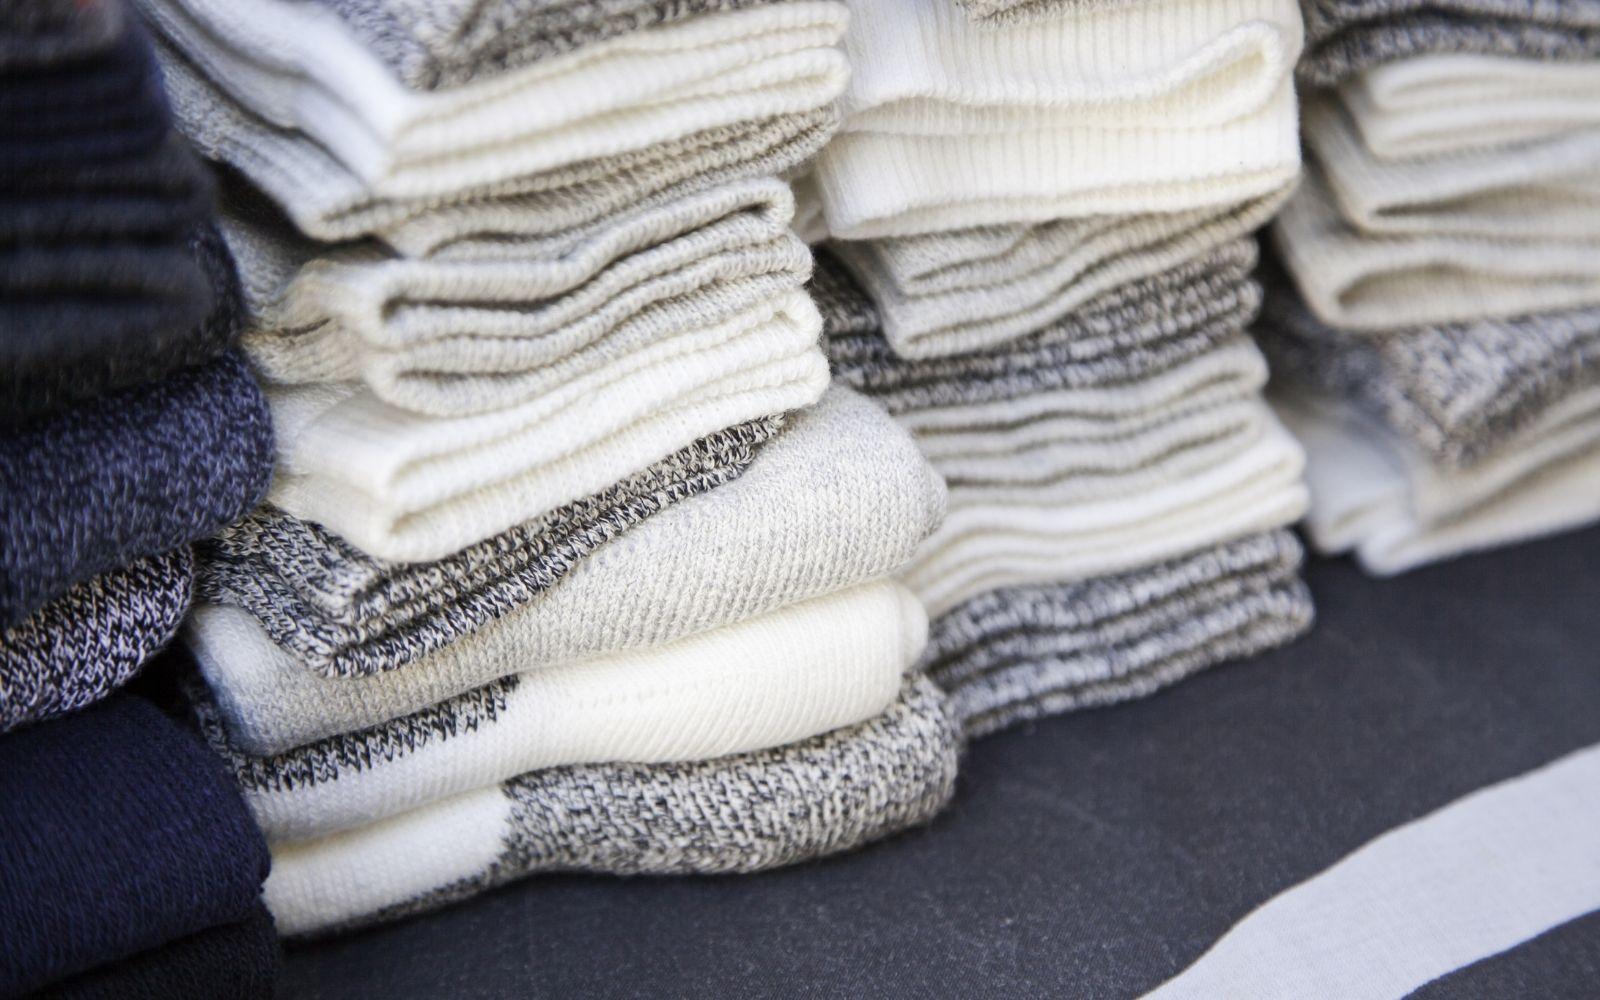 Donate Socks and Underwear